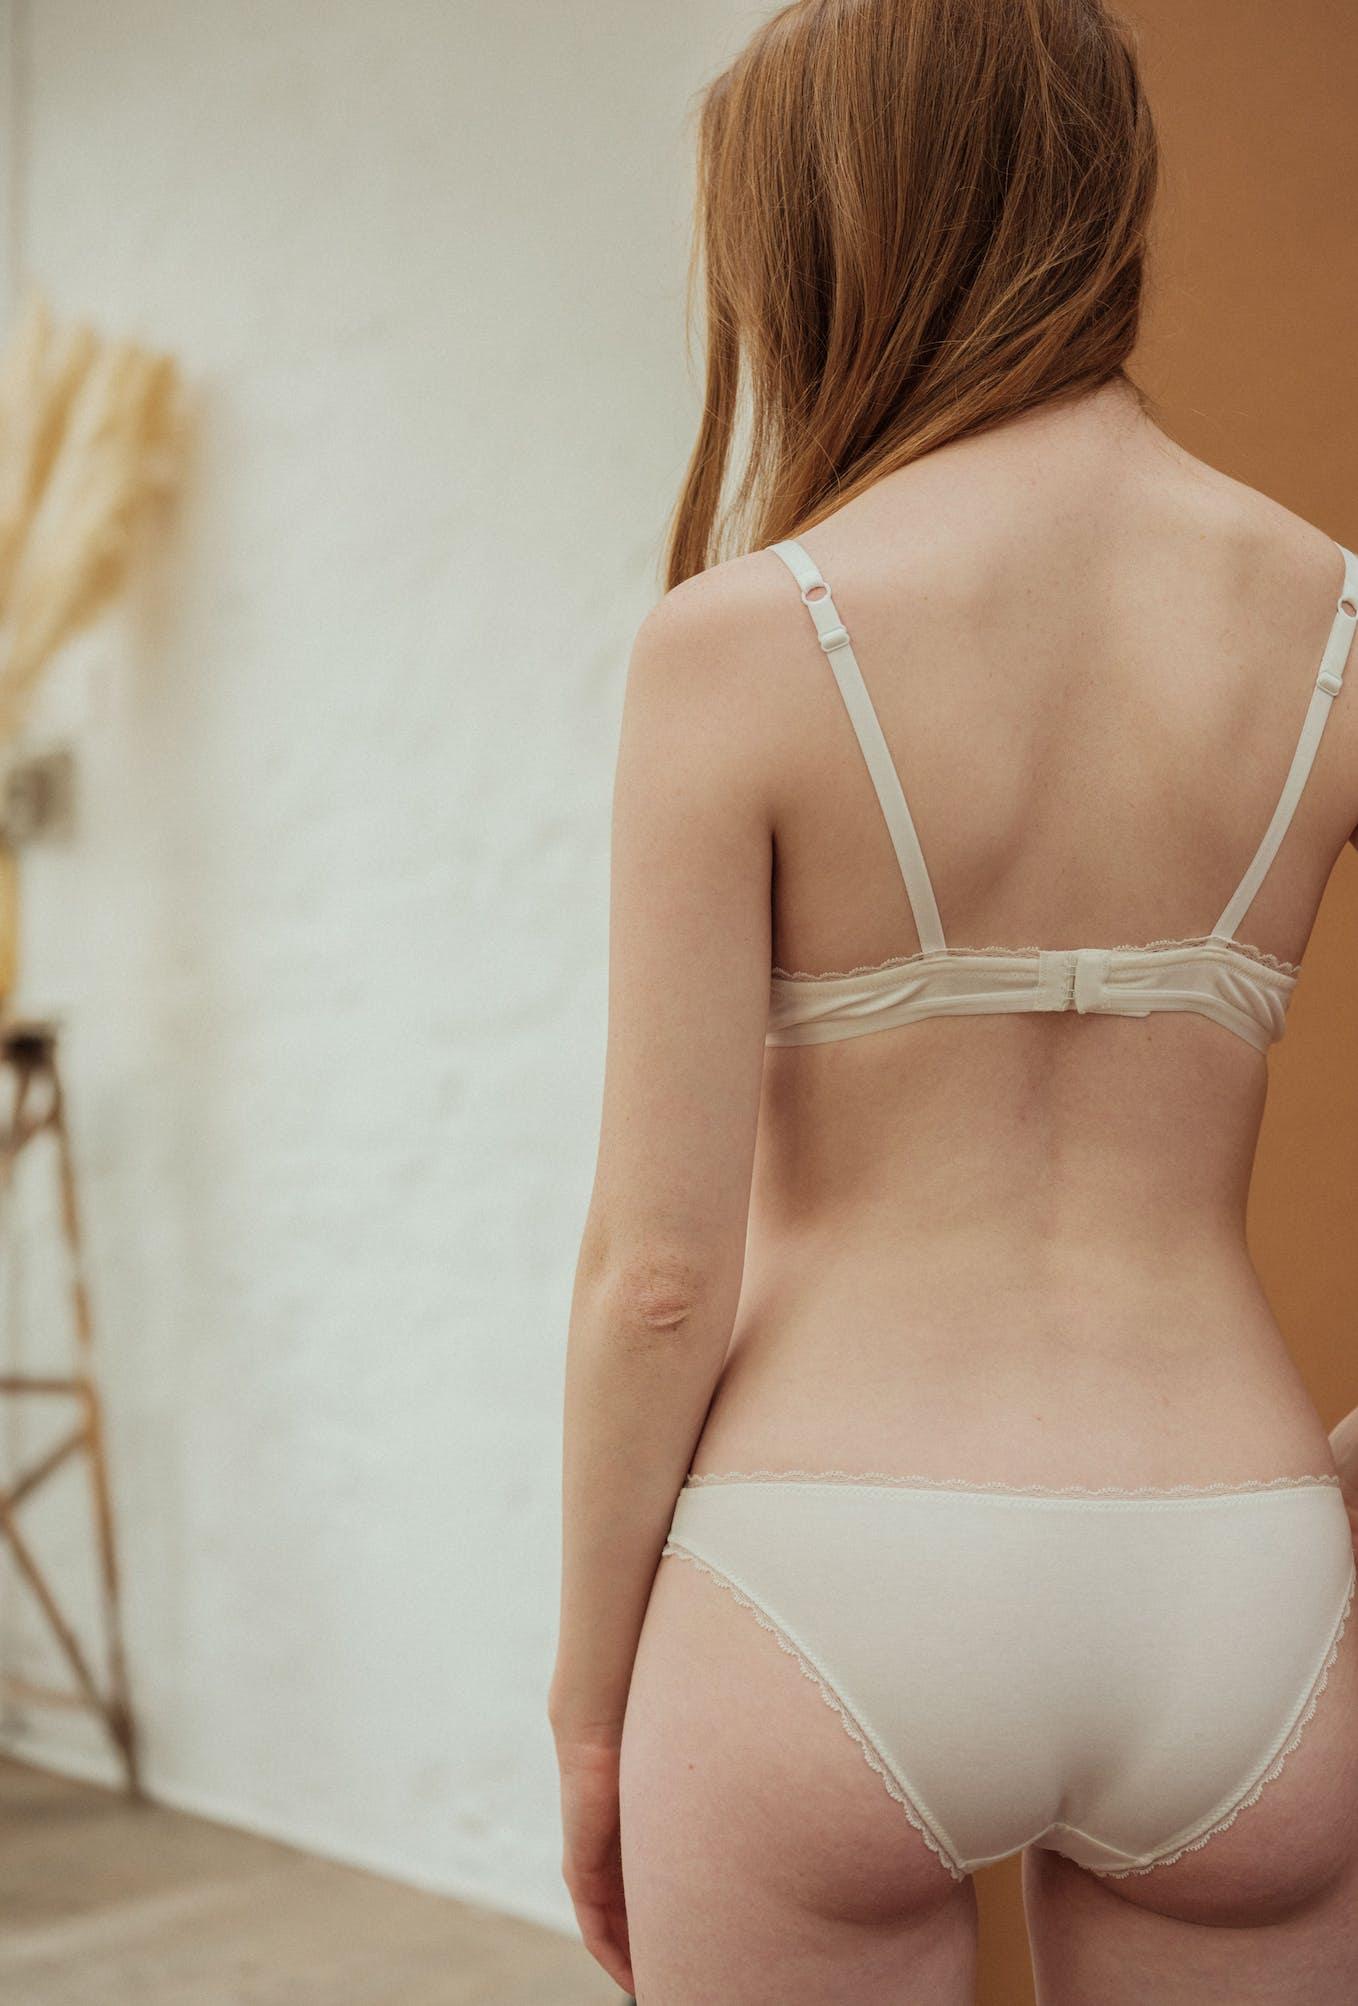 Première fois lingerie set in ivory with briefs